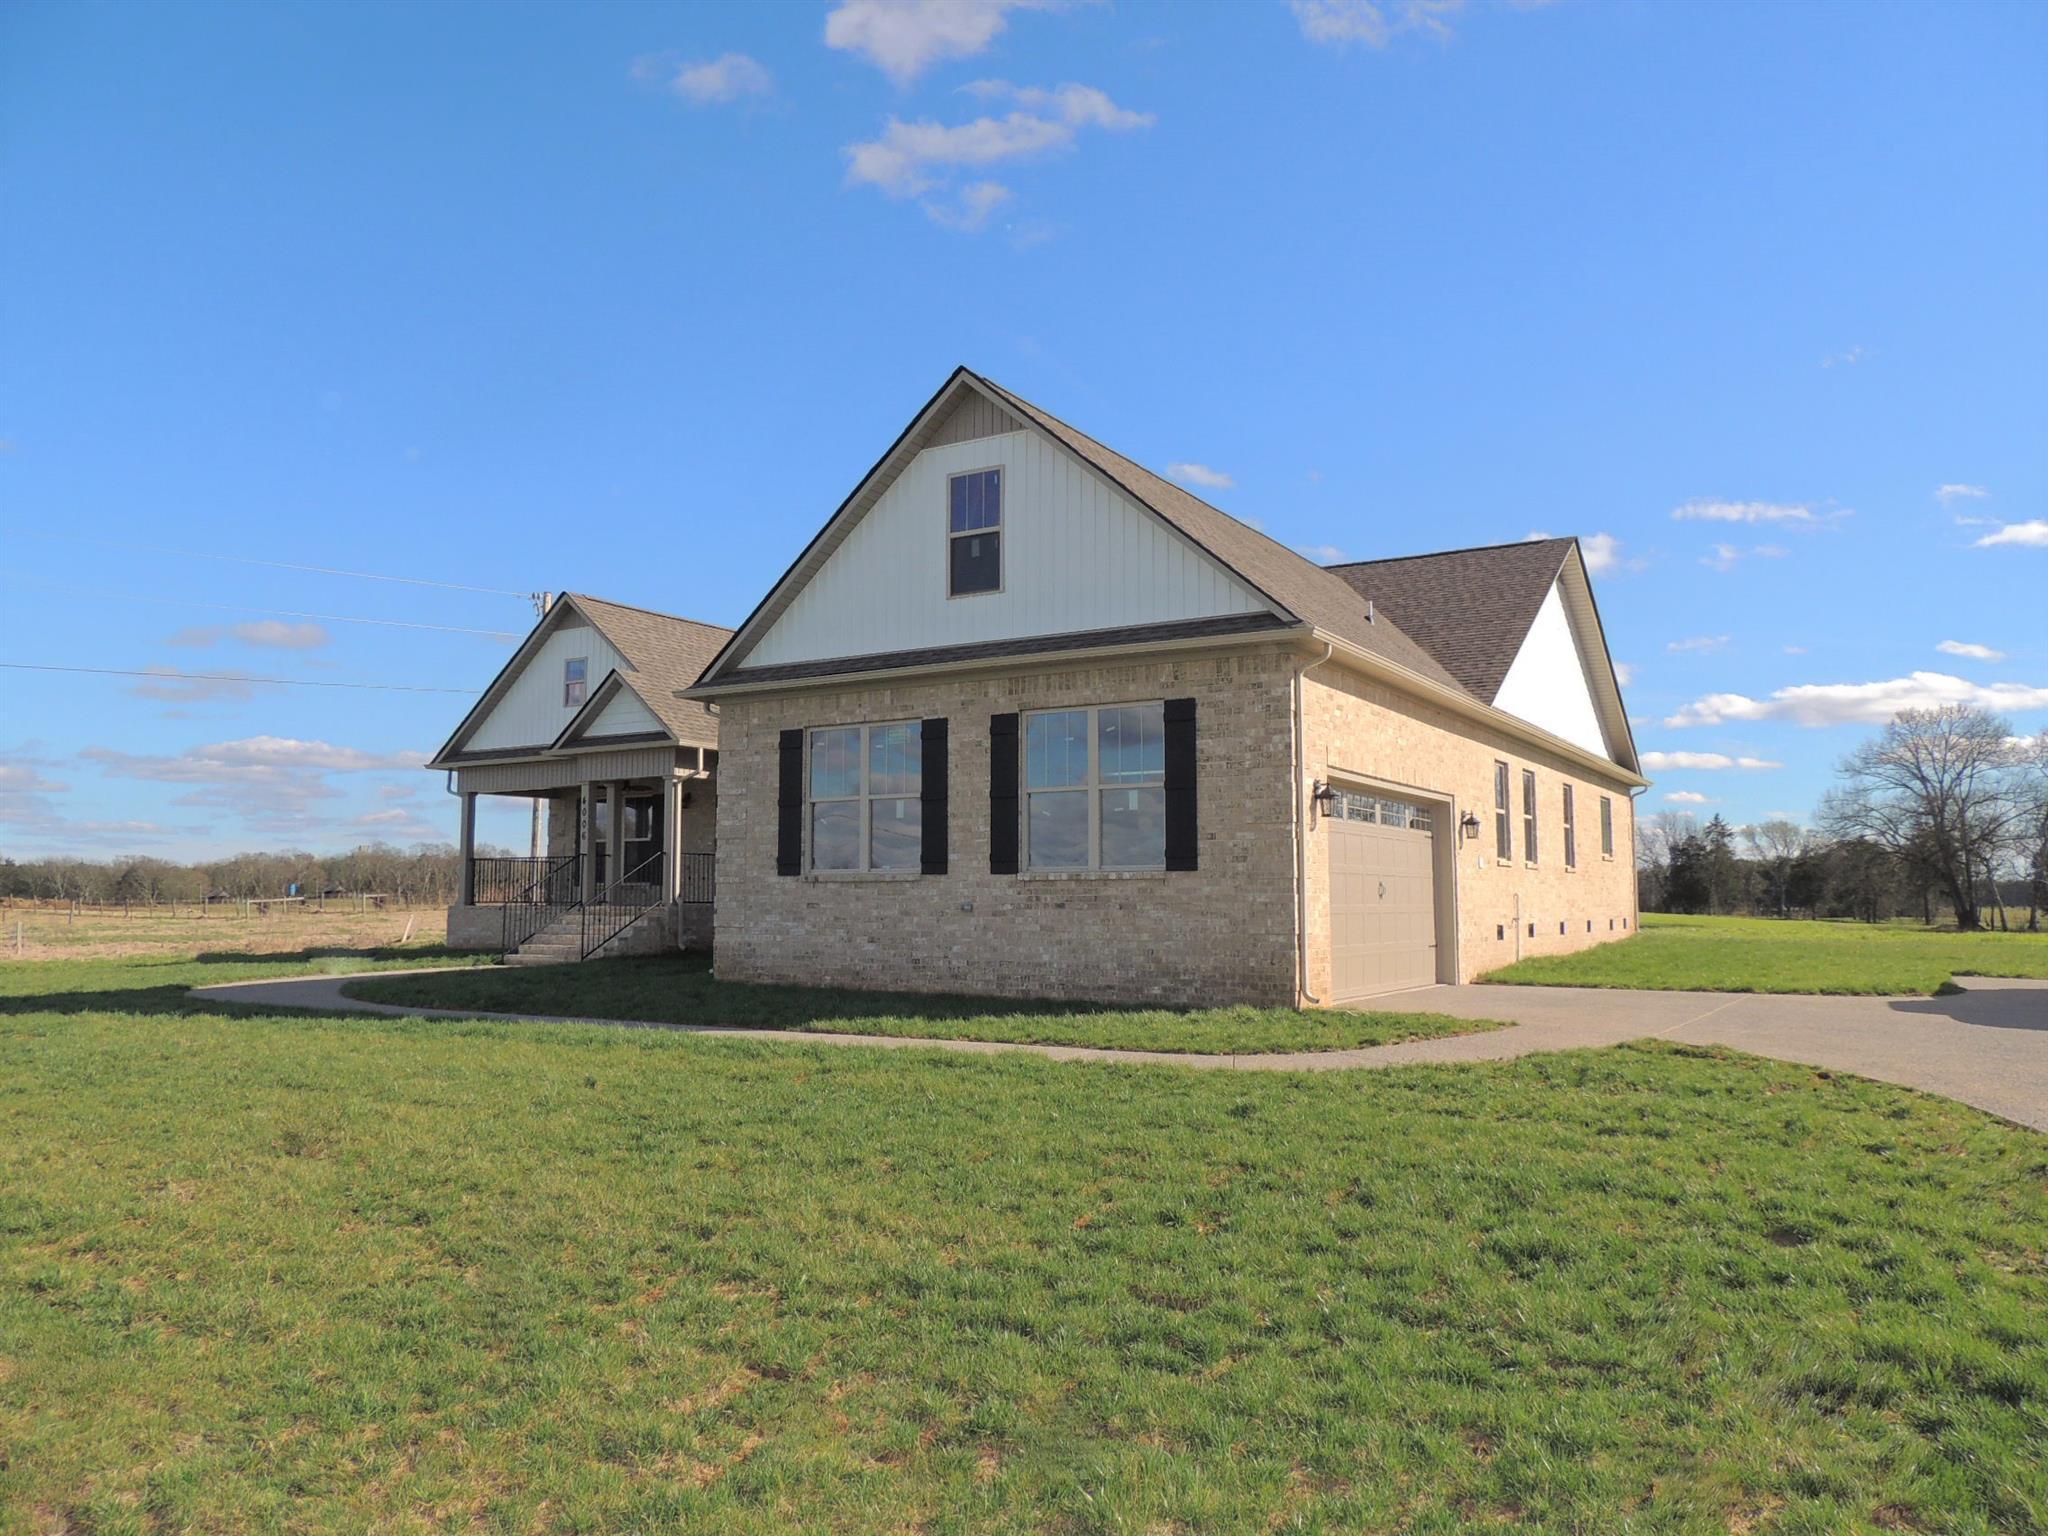 4006 Kelley Farris Rd, Columbia, TN 38401 - Columbia, TN real estate listing